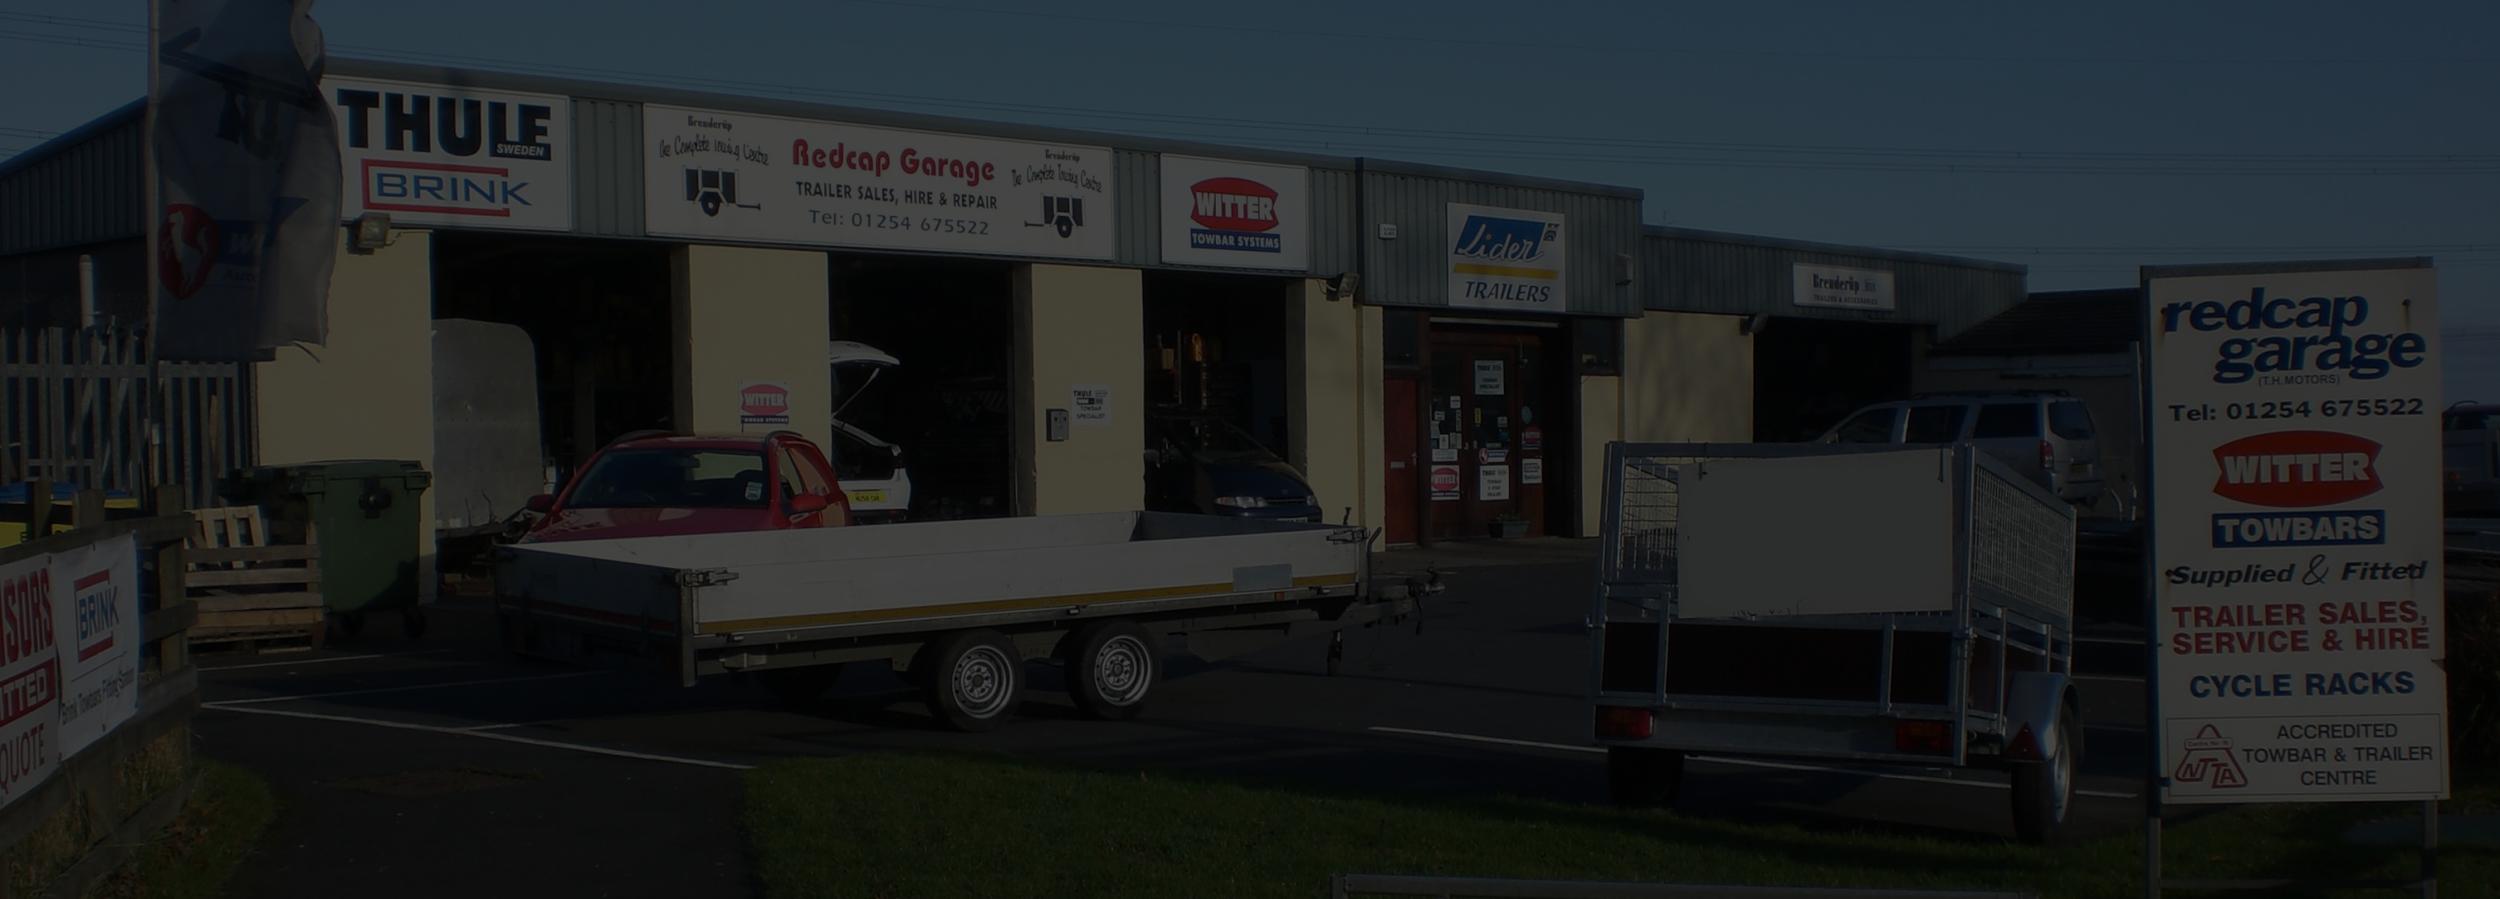 Redcap Towbar Trailer Centre Vauxhall Tow Bar Wiring